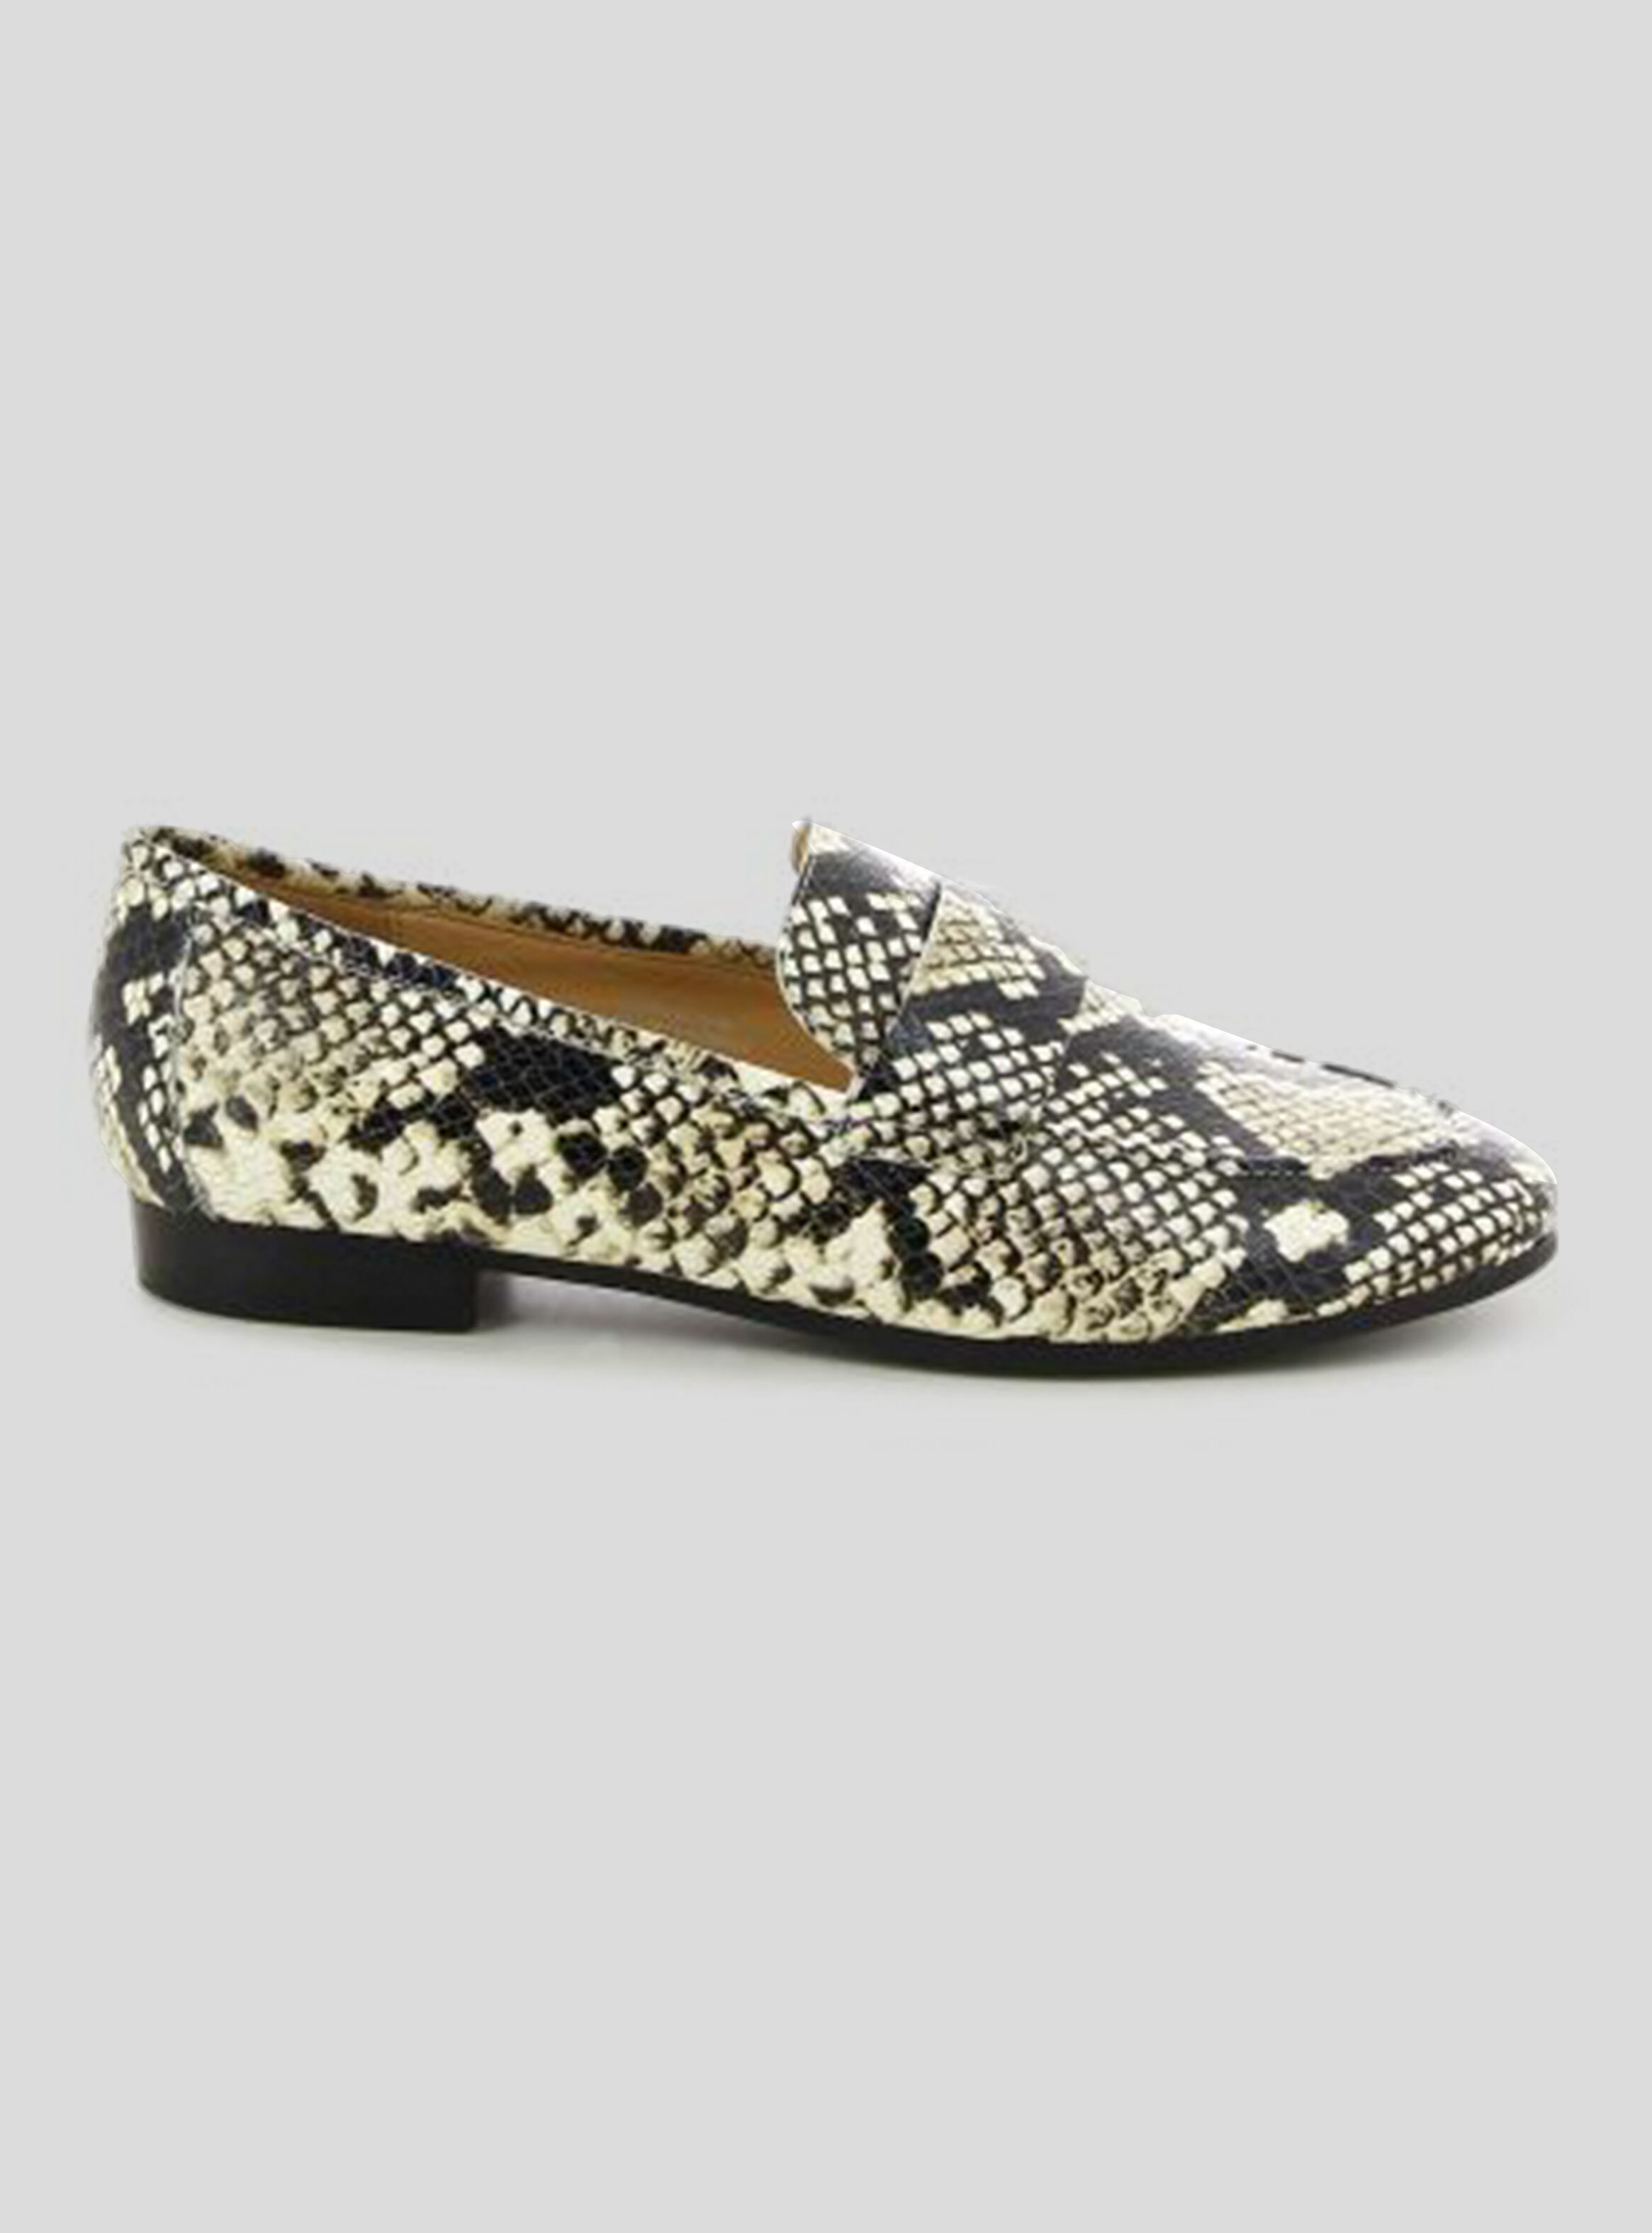 Zapatillas Adidas VL Court 2.0 Mujer NegroPlateado